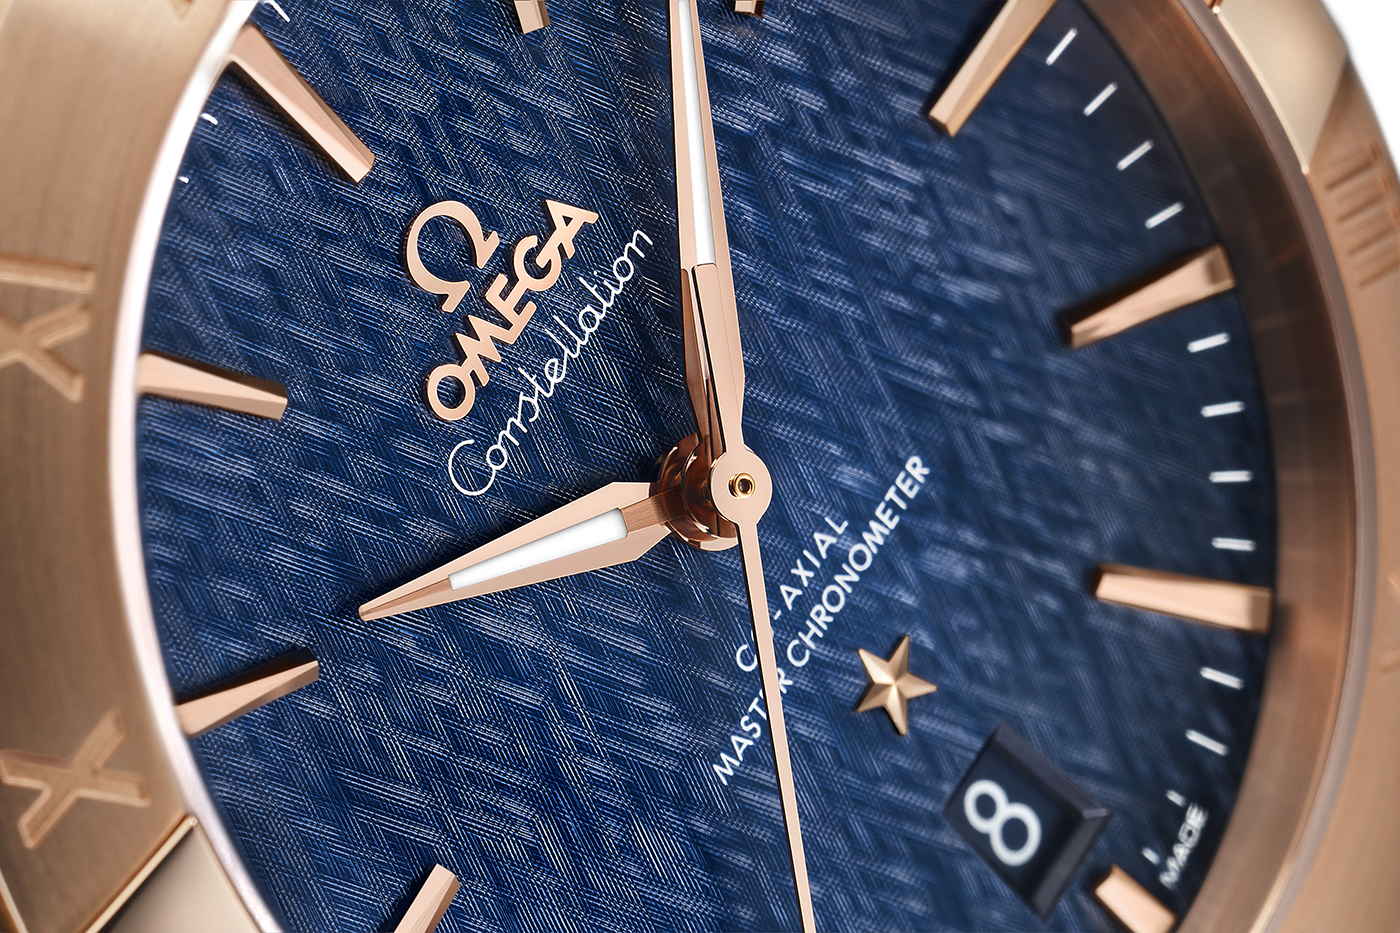 Copie-Constellation-Omega-Pour-Hommes-3